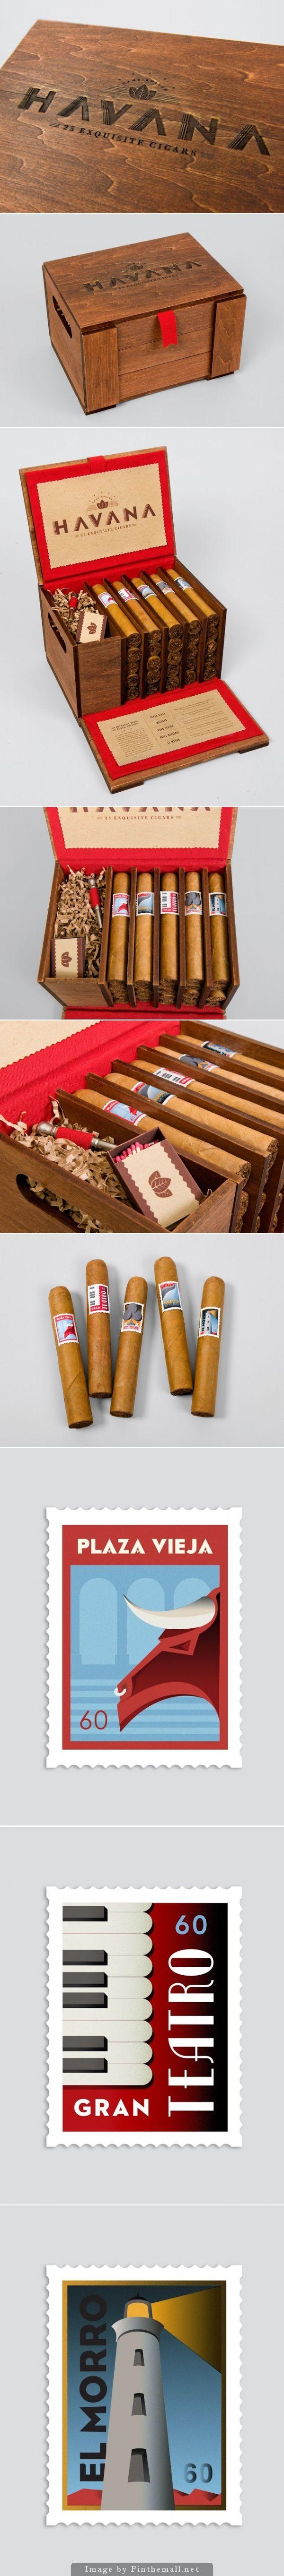 Havana Cigars (Student Project) PD